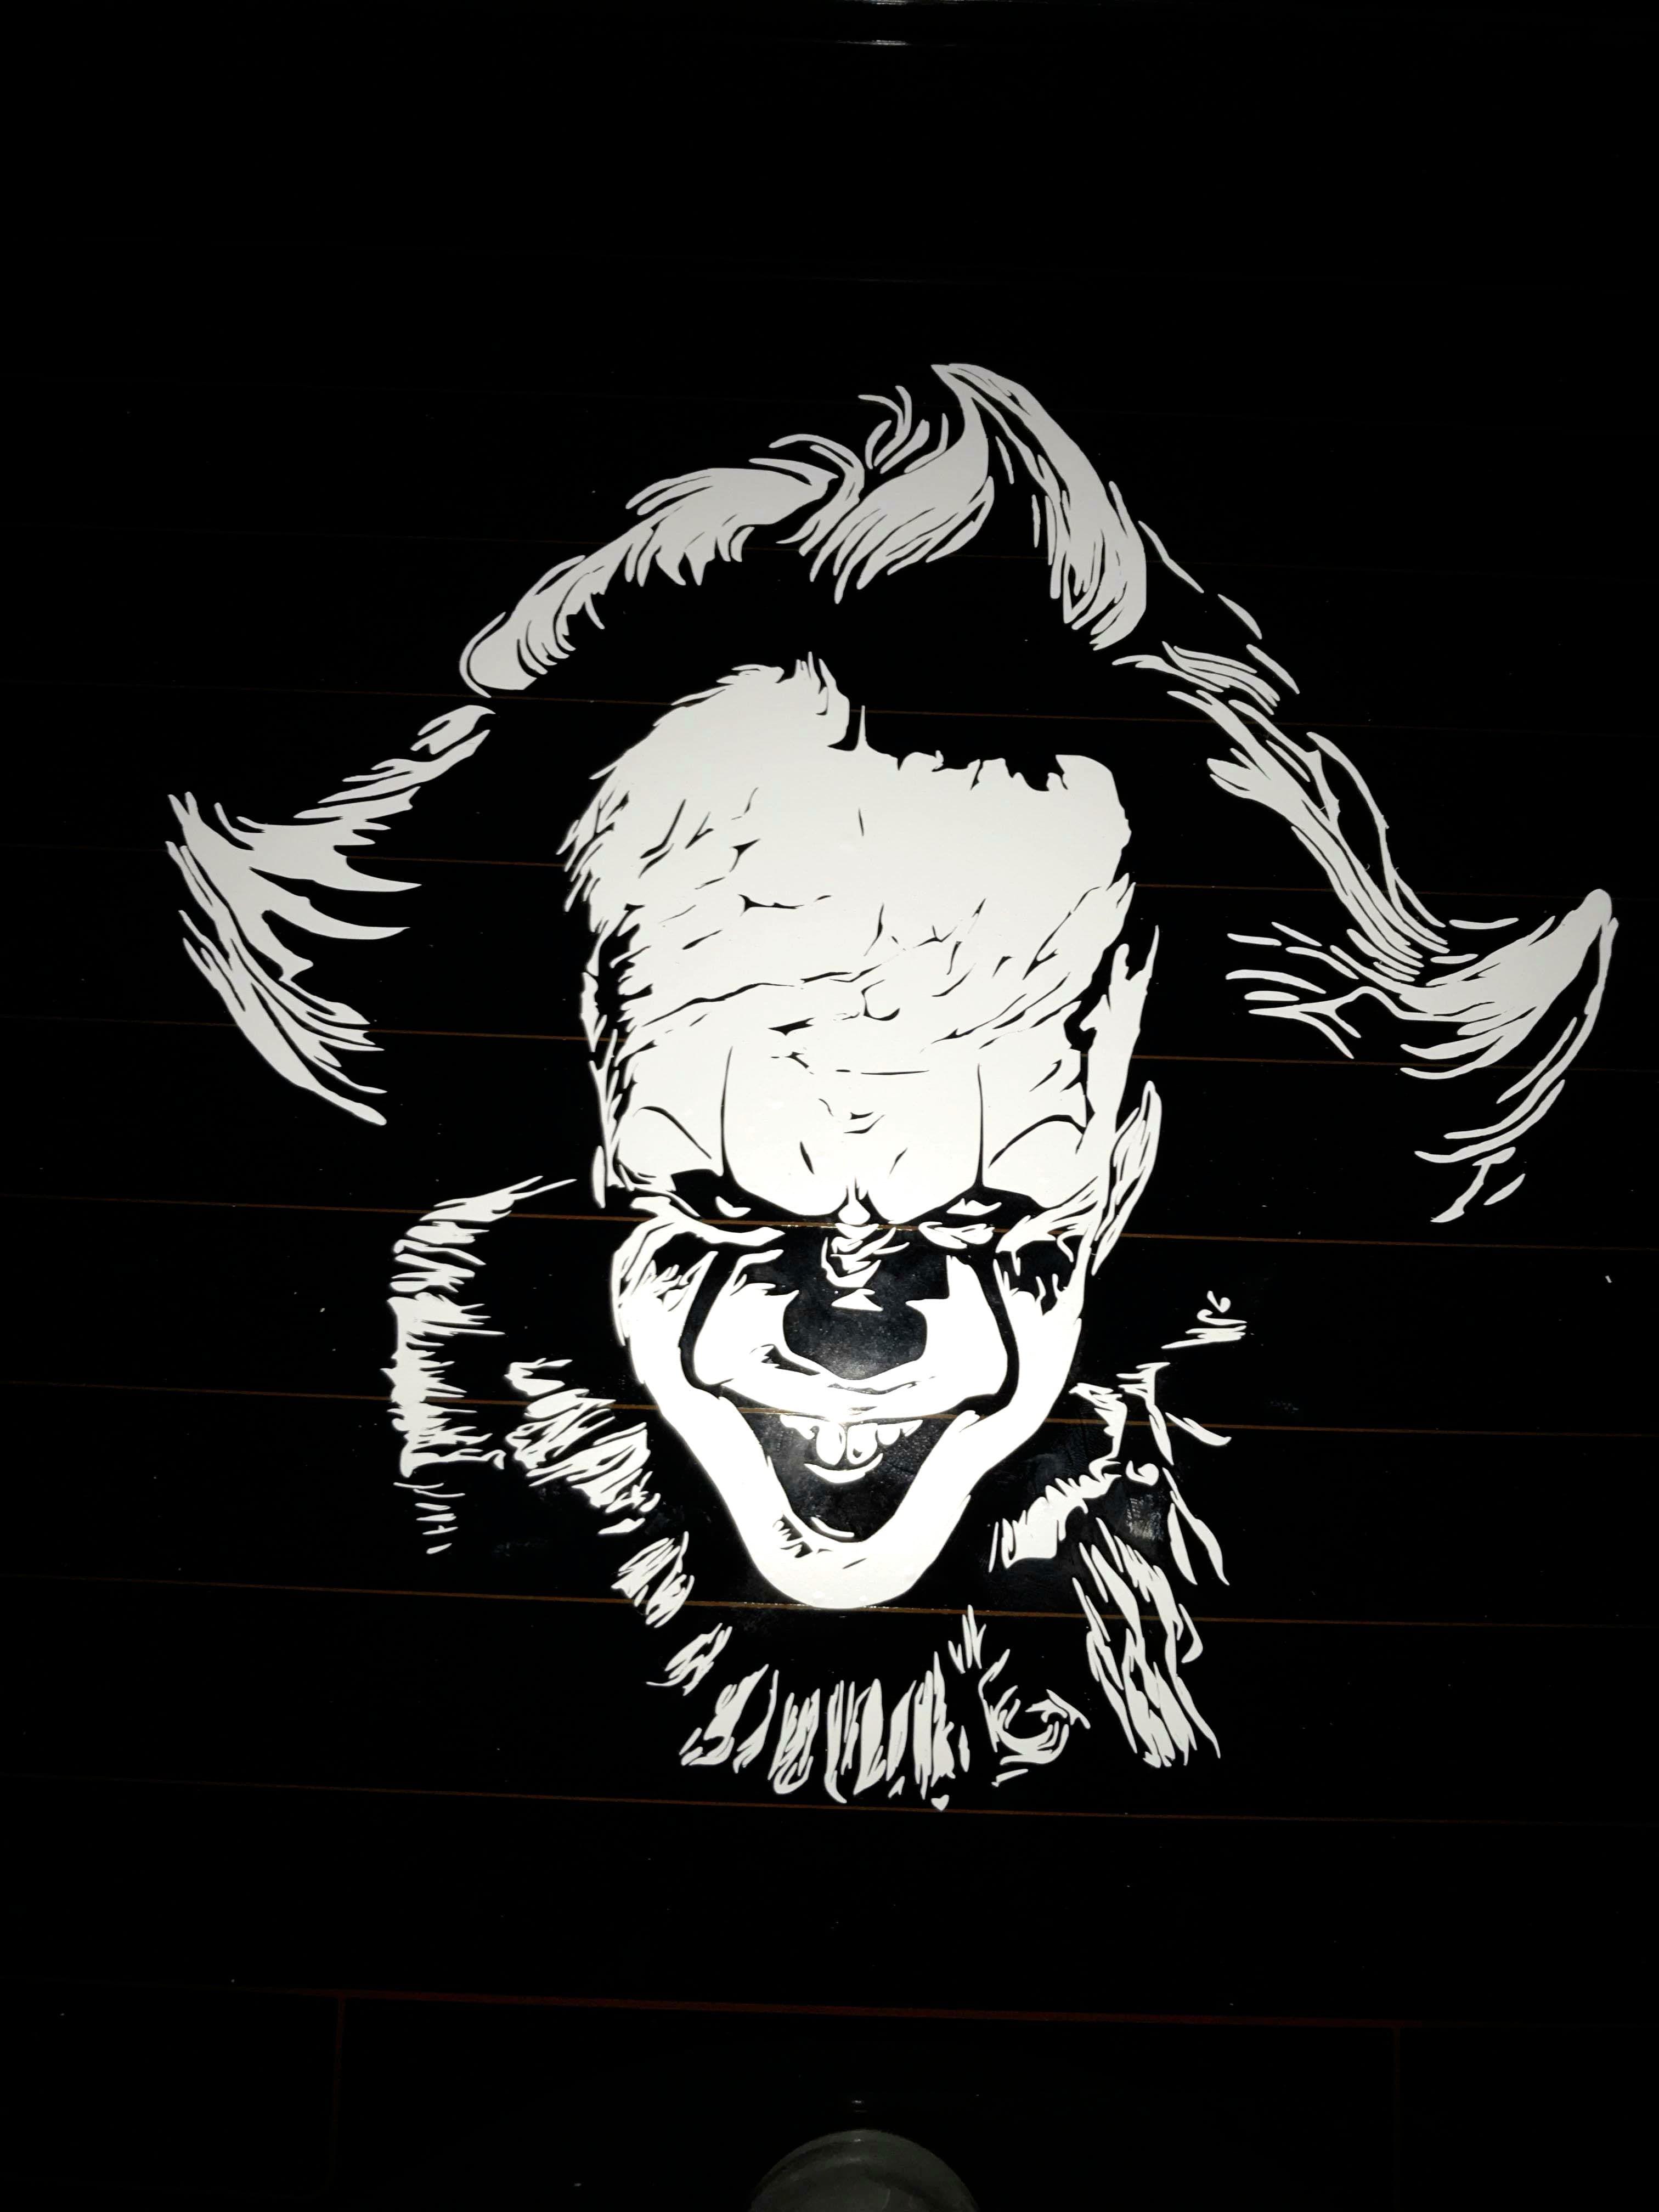 Pennywise IT Clown Stephen King Car Sticker Vinyl Decal Creepy Scary Halloween